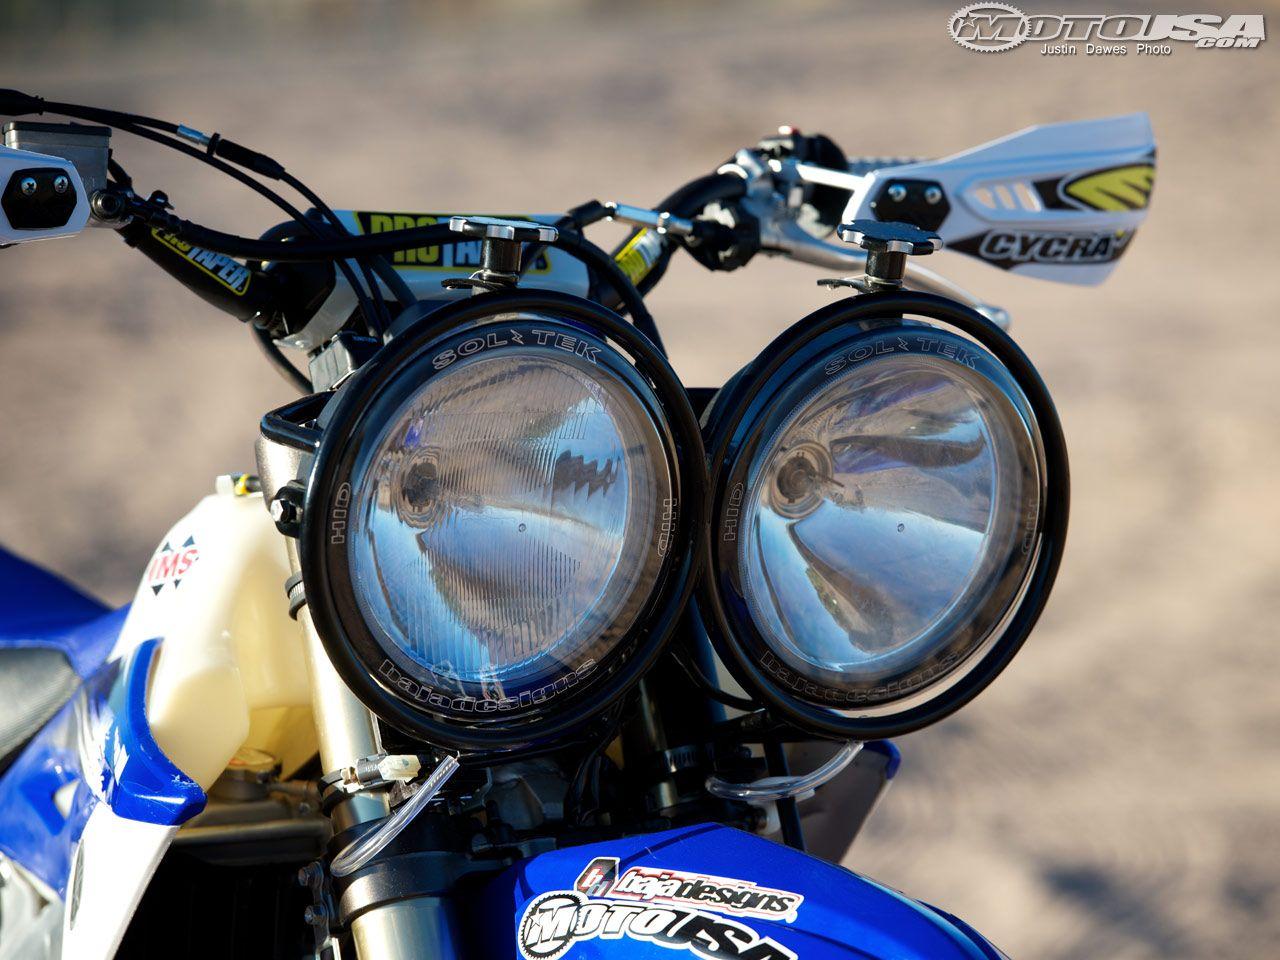 12_yamaha_WR450F_ProjectBike_14.jpg (1280×960) | Bikes | Pinterest ... for Motorcycle Headlight Design  143gtk